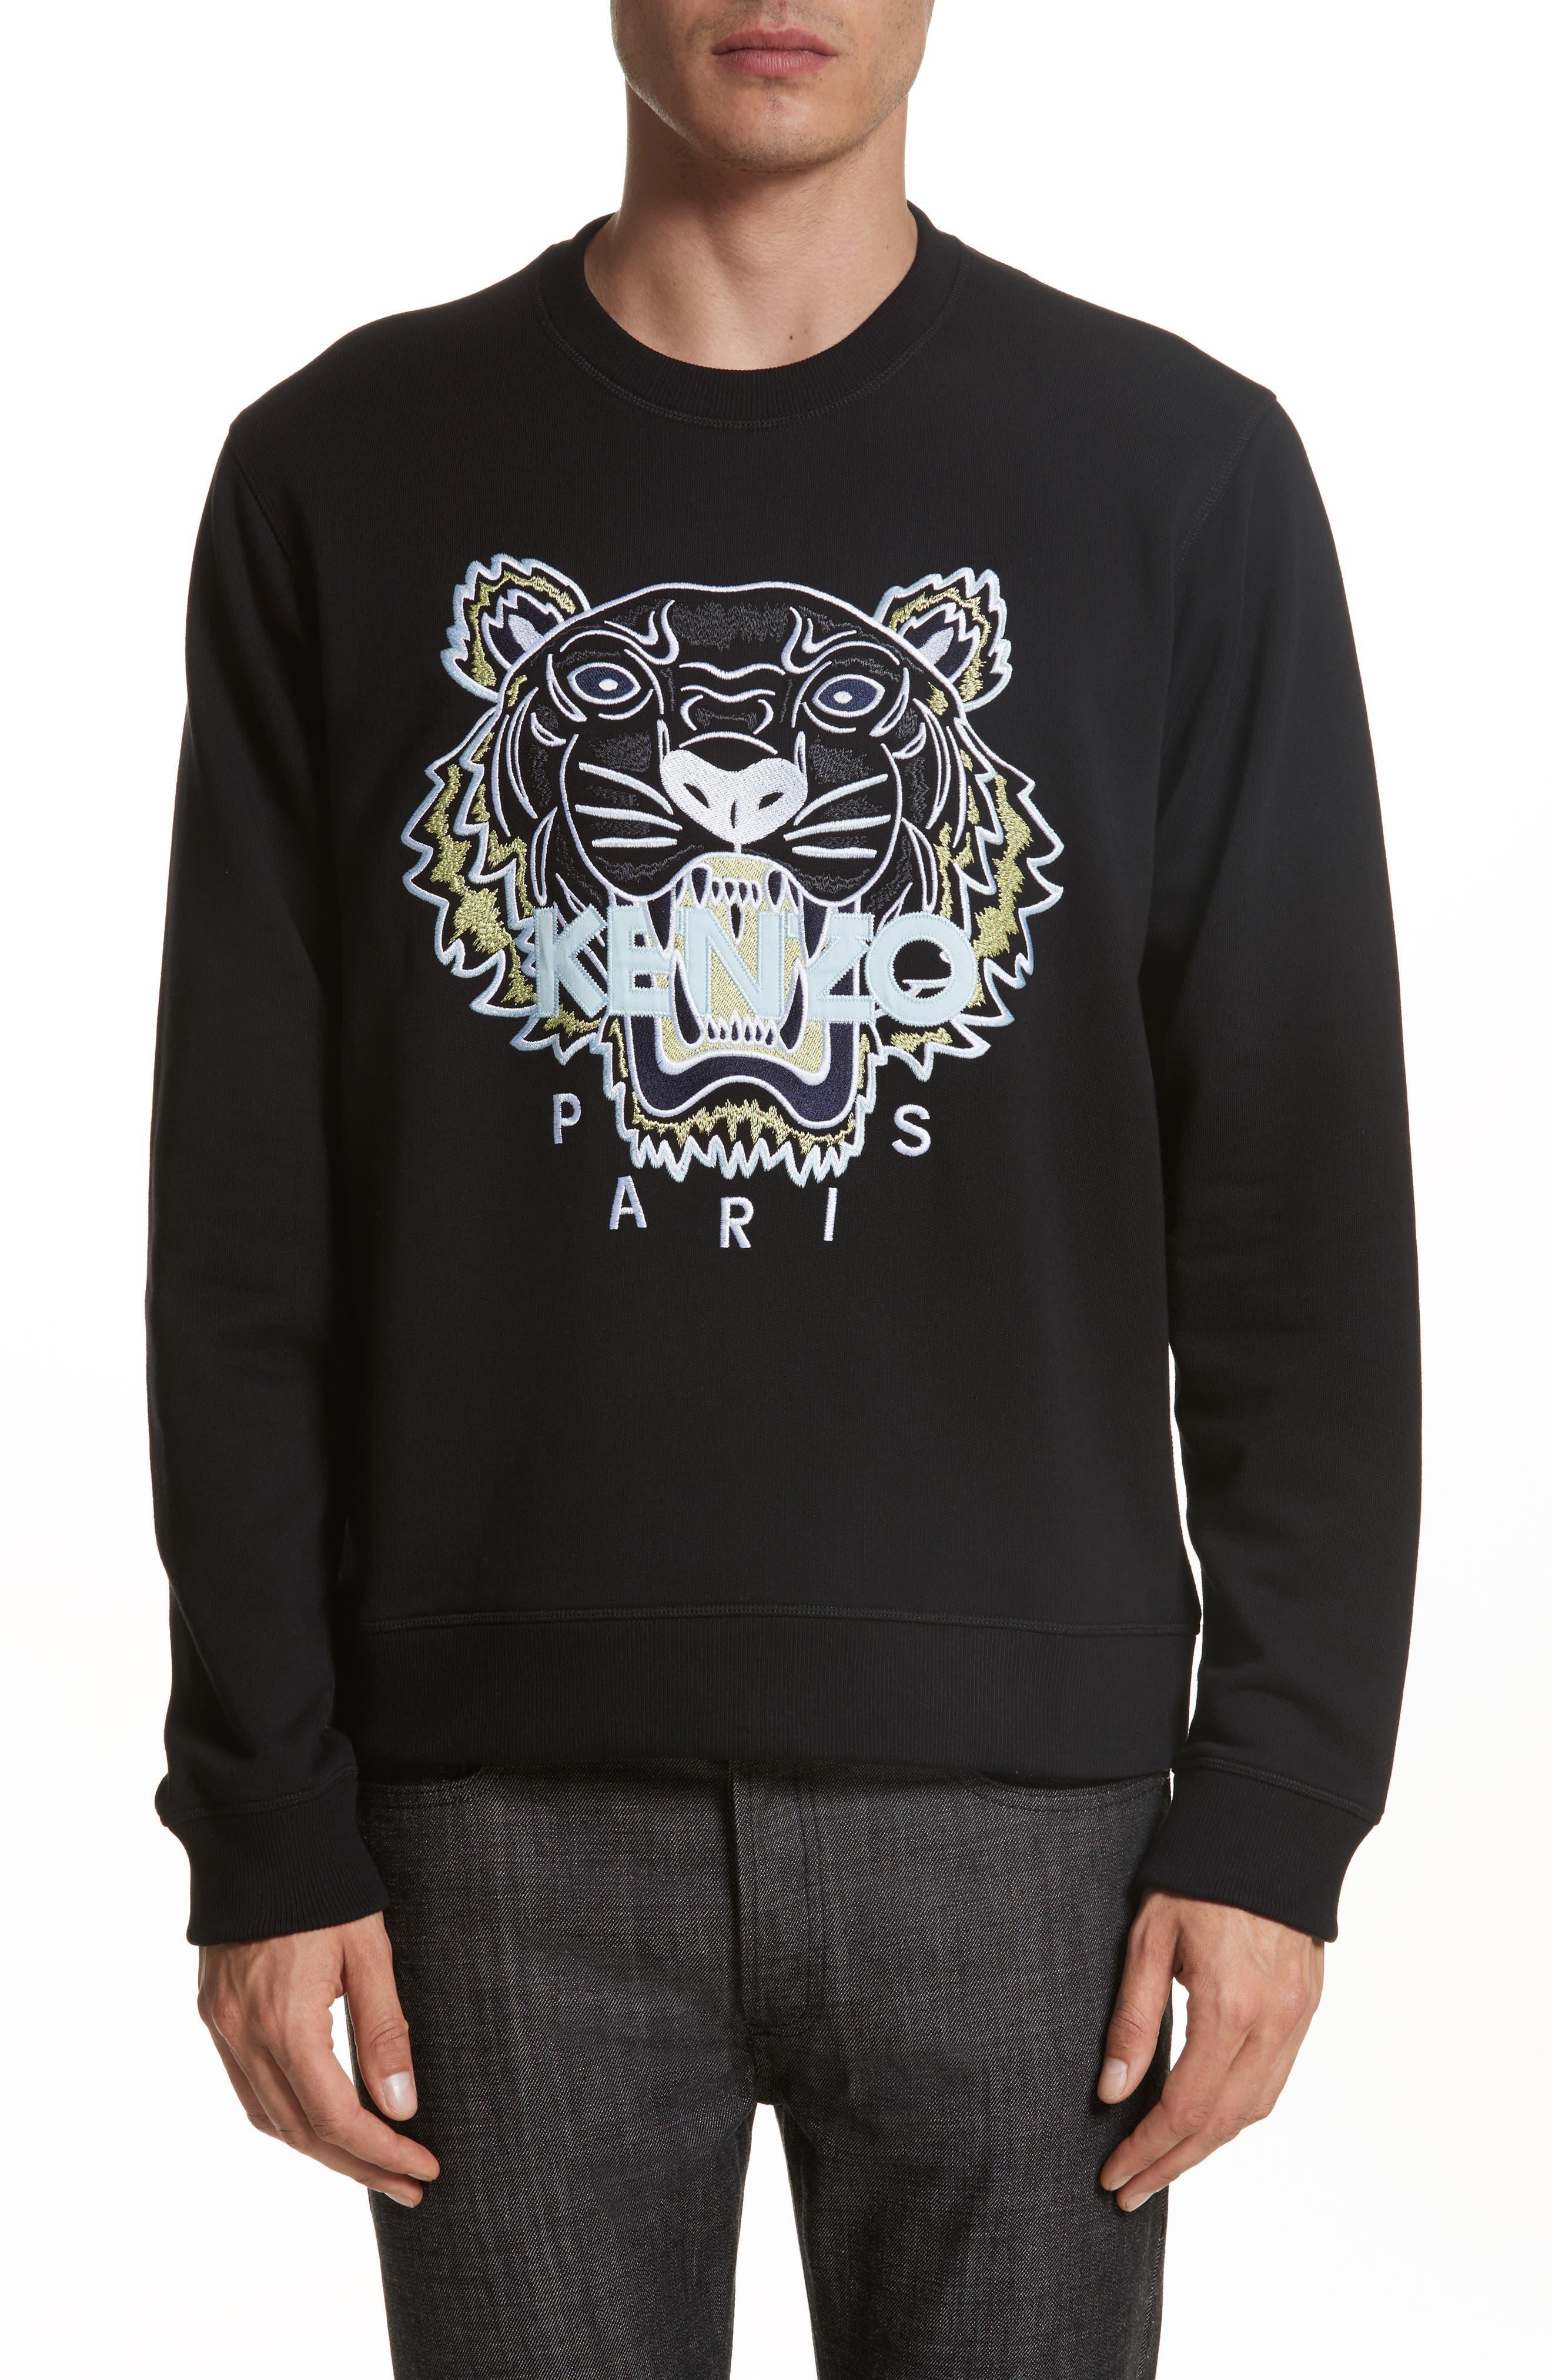 Alternate Image 1 Selected - KENZO Embroidered Graphic Sweatshirt